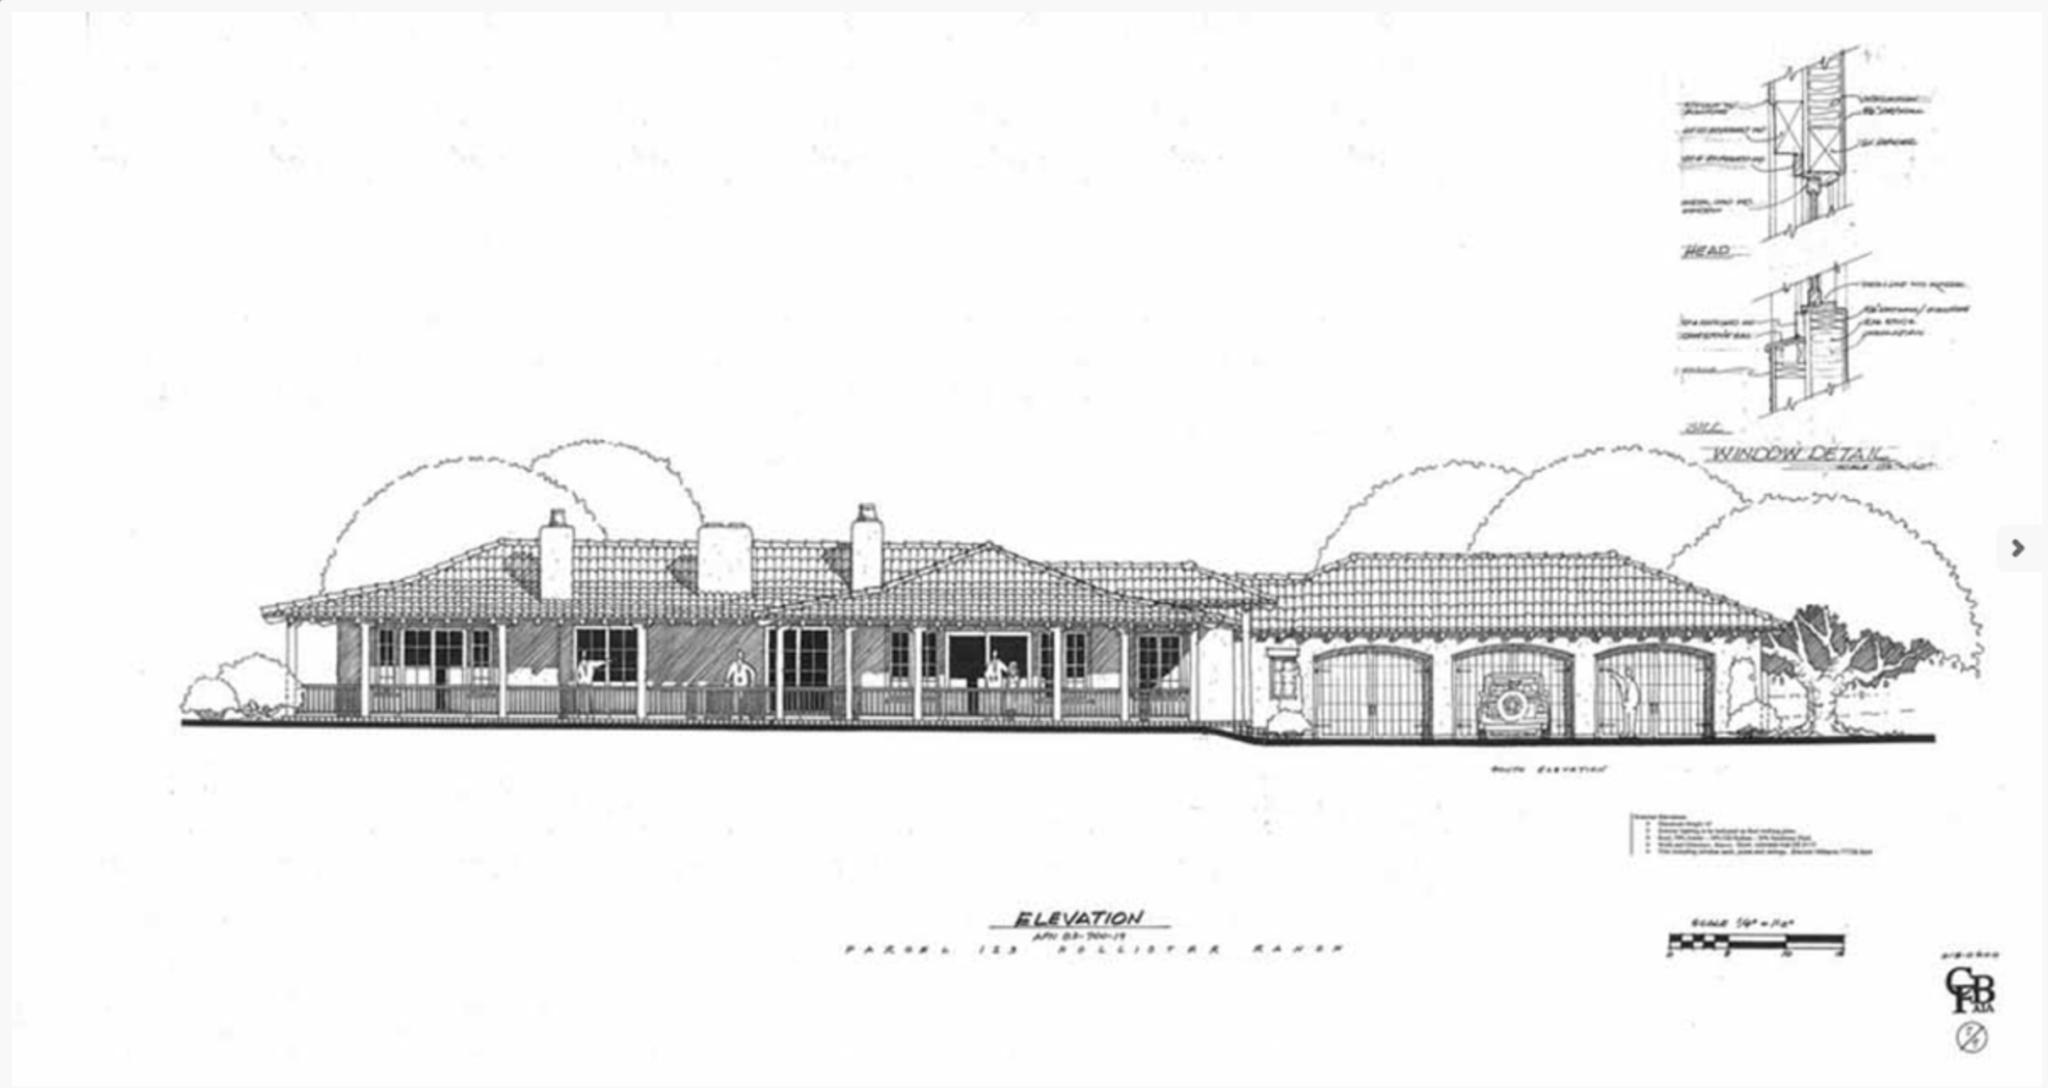 Hollister Ranch 123 - Main Home